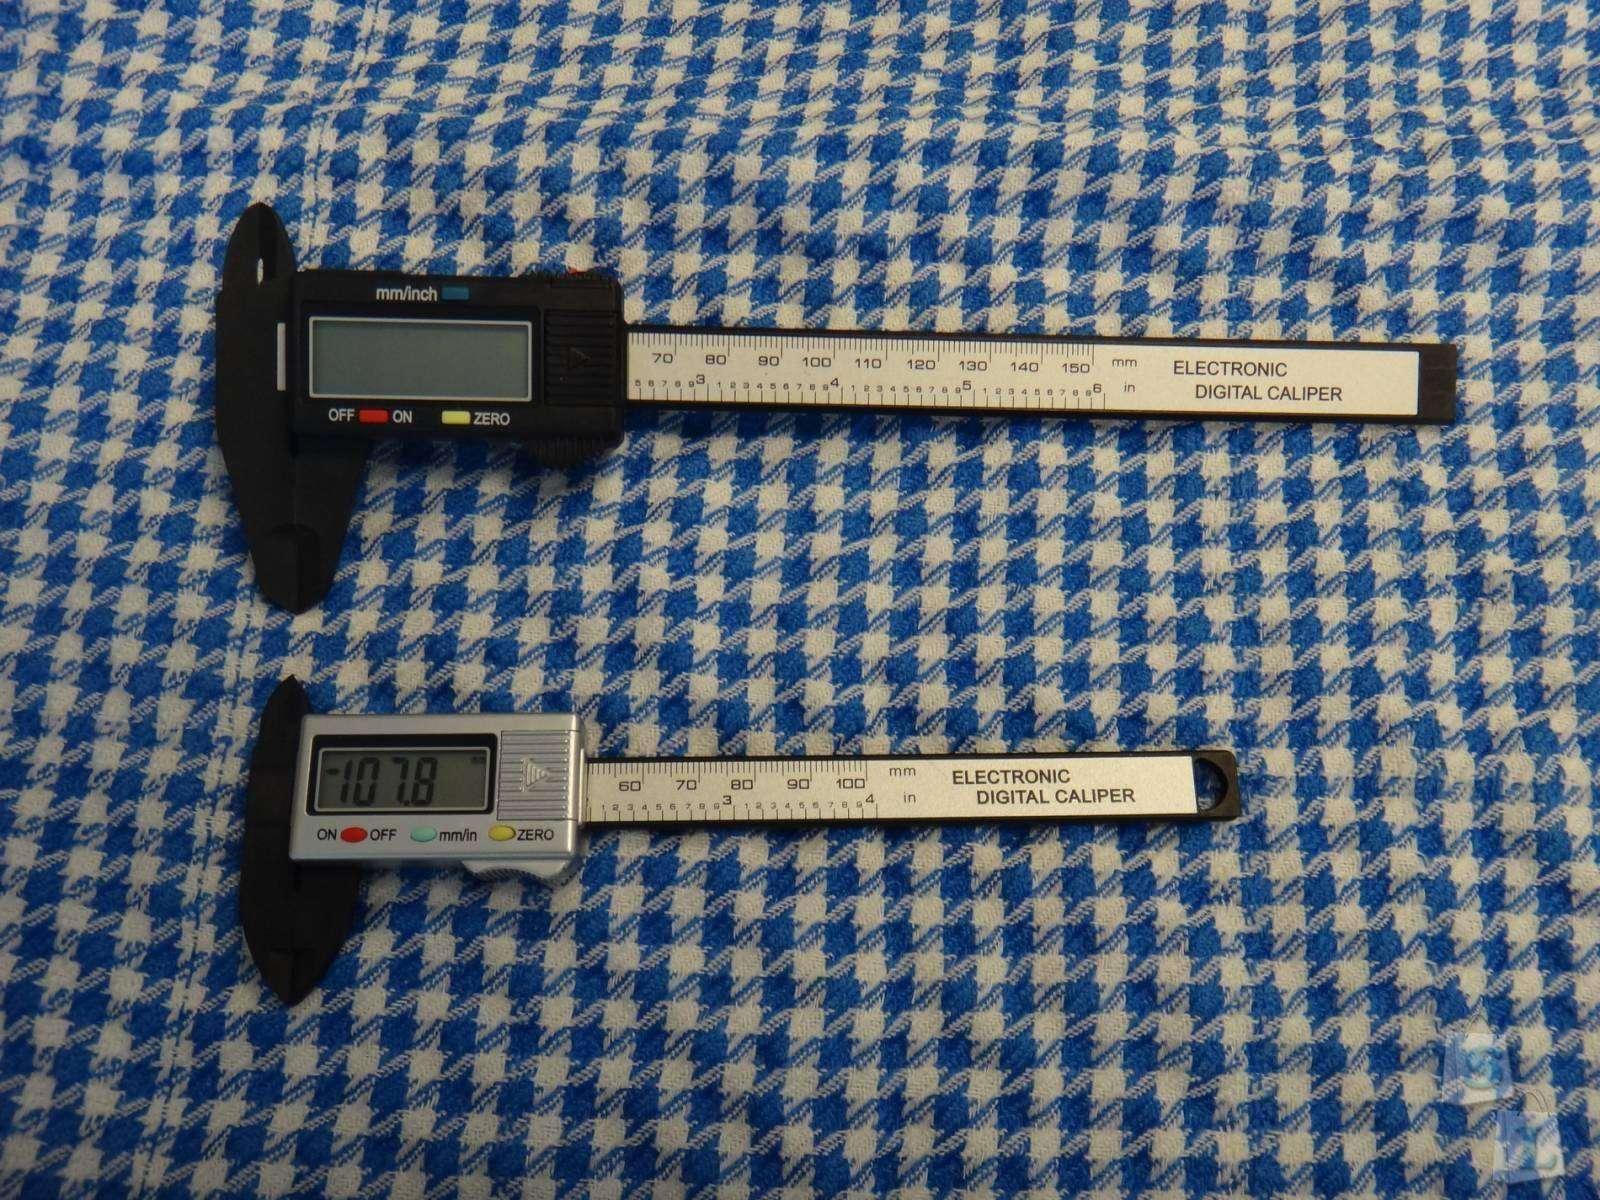 GearBest: Компактный электронный штангенциркуль - 100 mm Digital Vernier Caliper Micrometer